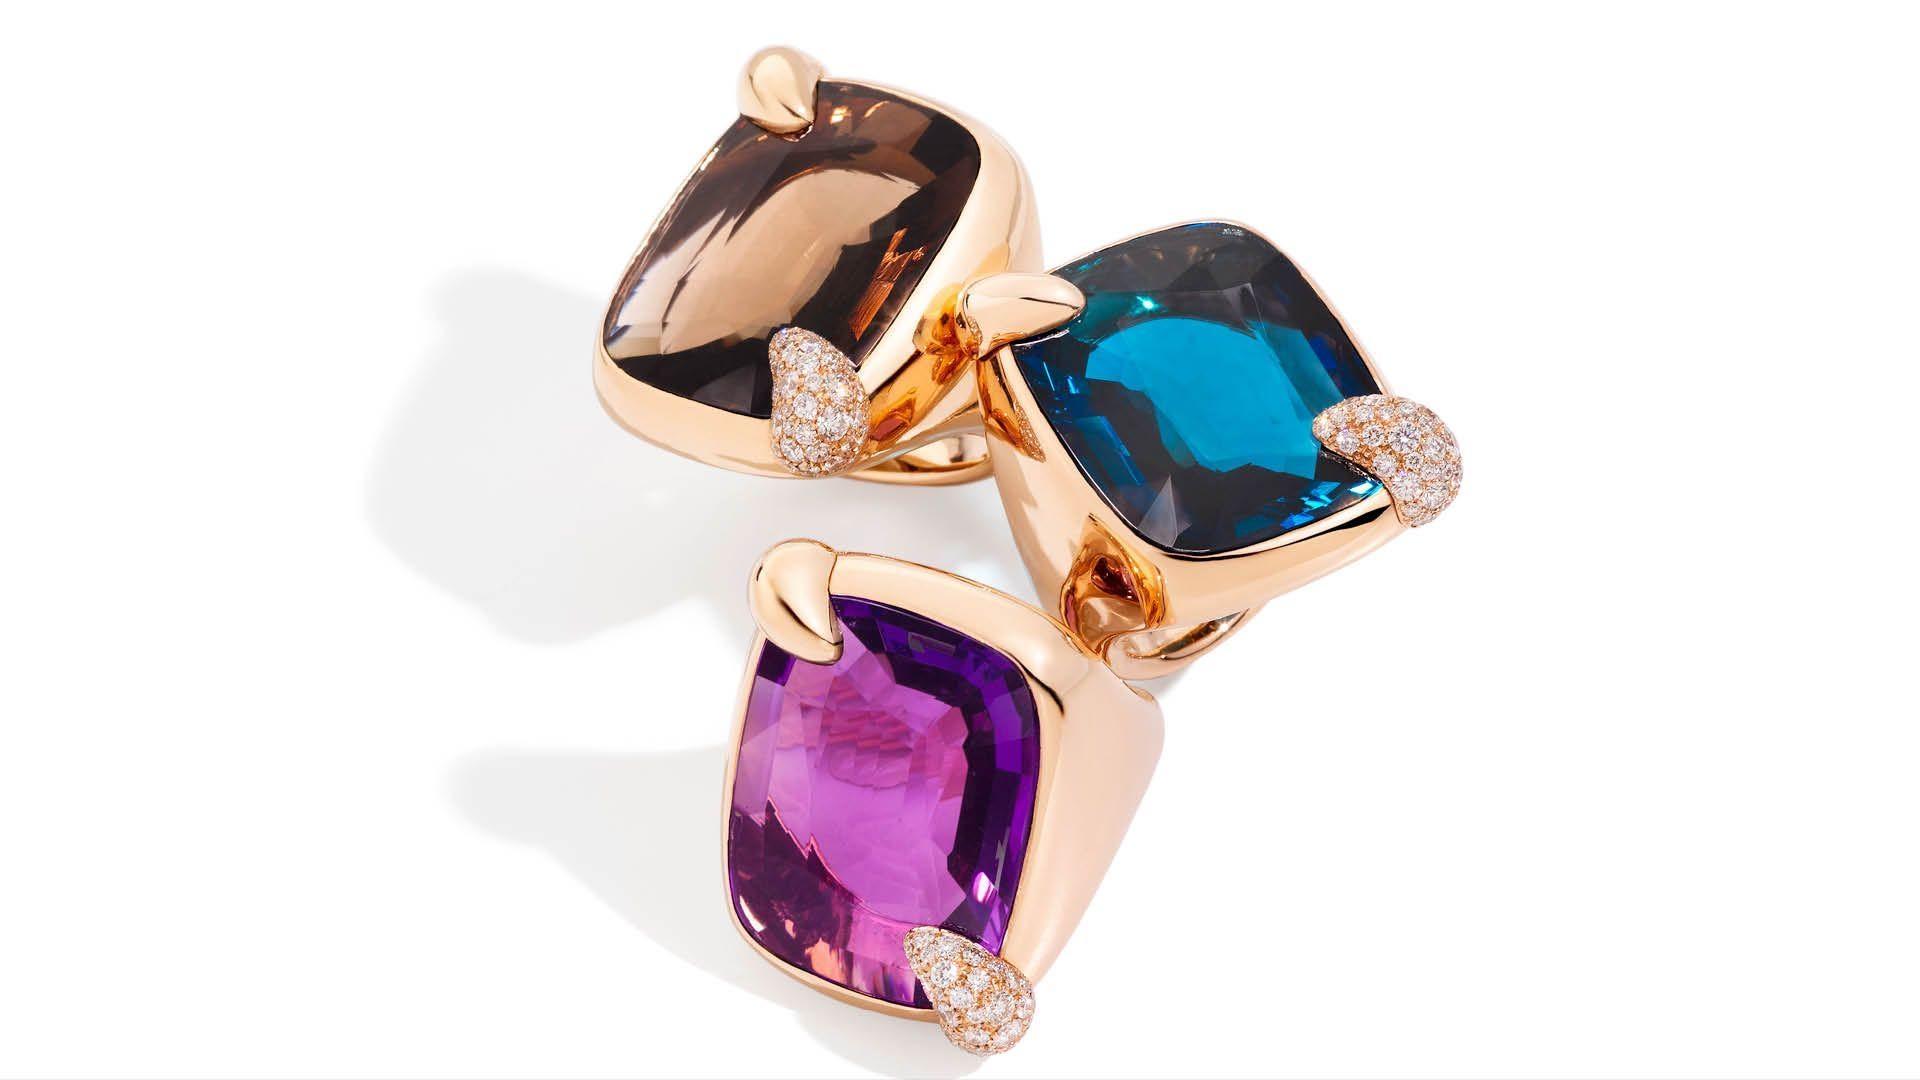 Exclusive: Pomellato CEO Sabina Belli Talks Gemstone And Jewellery Trends